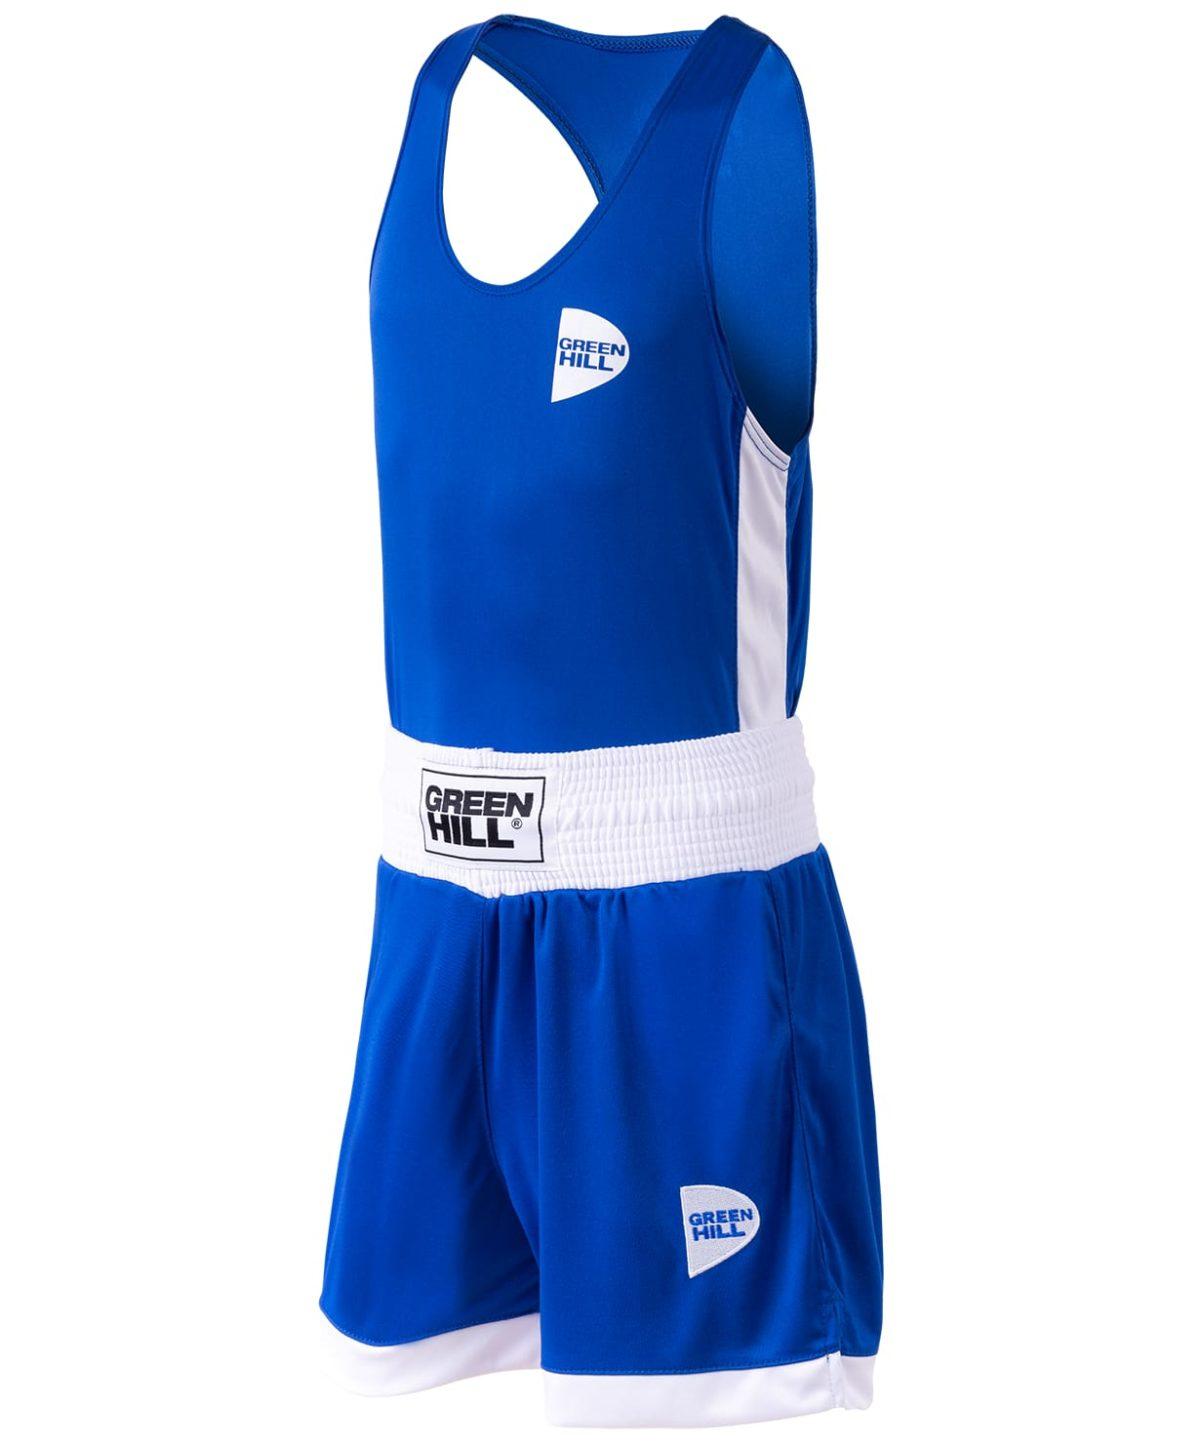 GREEN HILL Interlock Форма для бокса детская BSI-3805: синий - 1